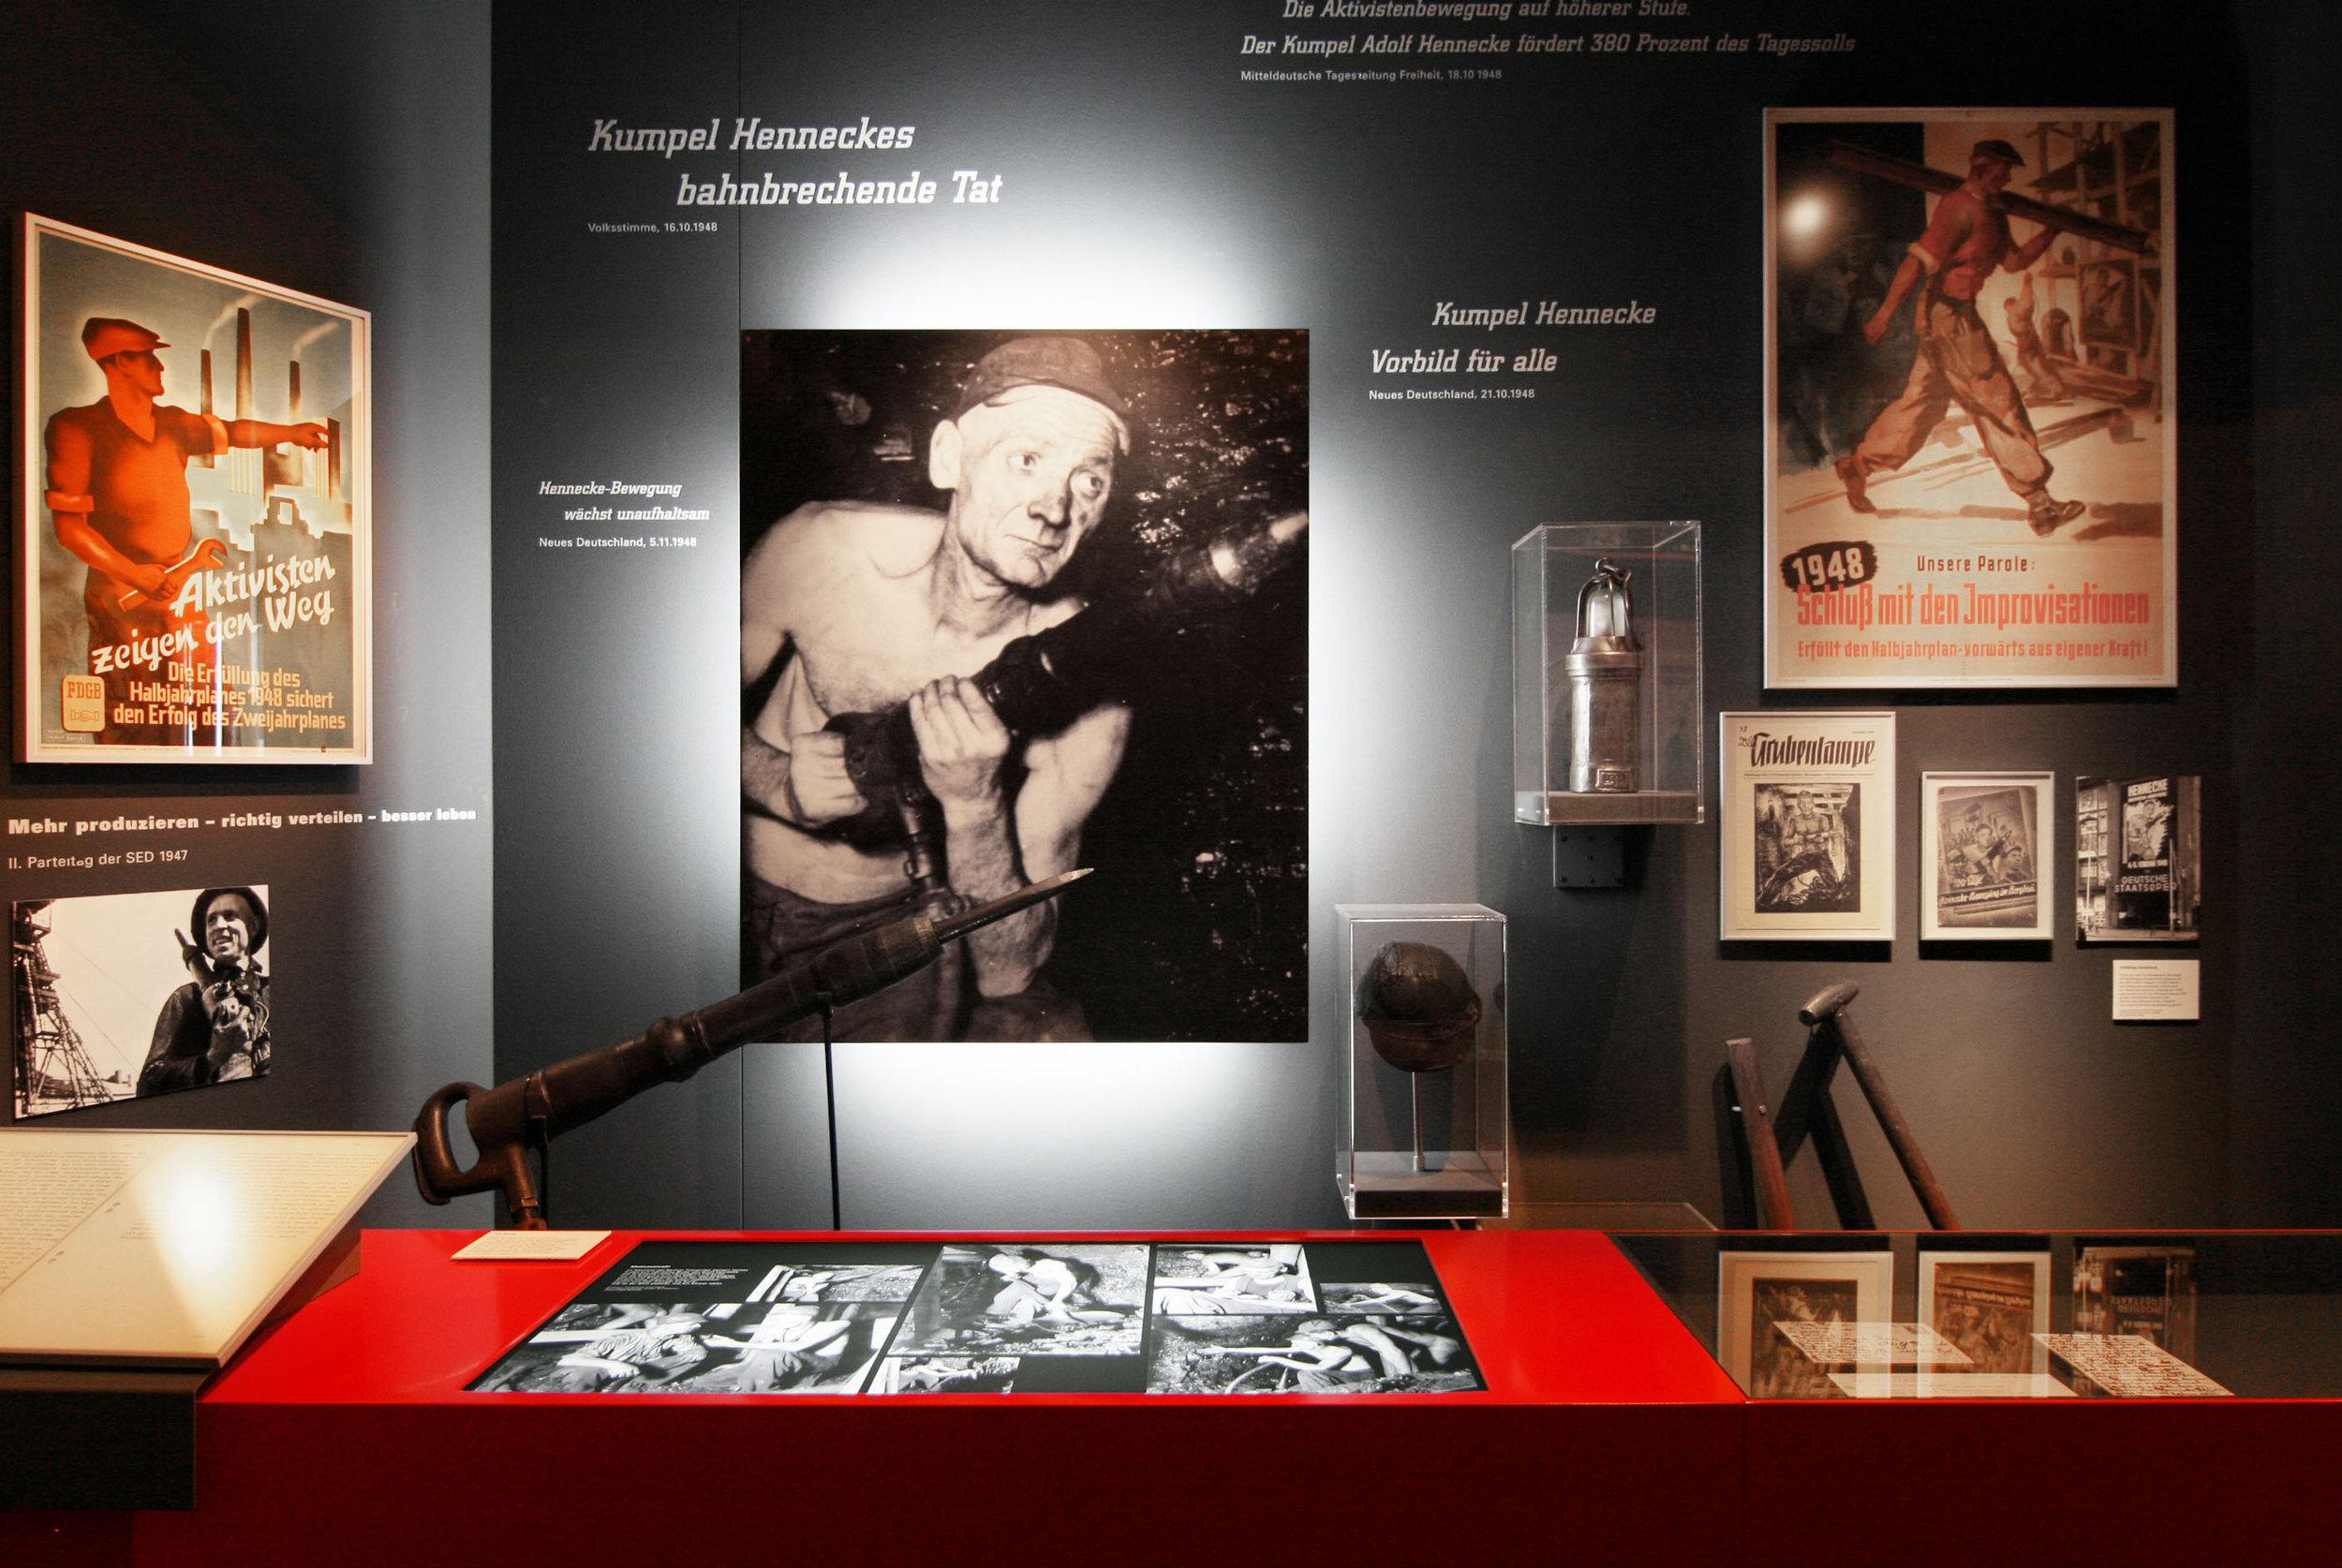 bilder-im-kopf_museum-exhibition-design_coordination-berlin_06.jpg